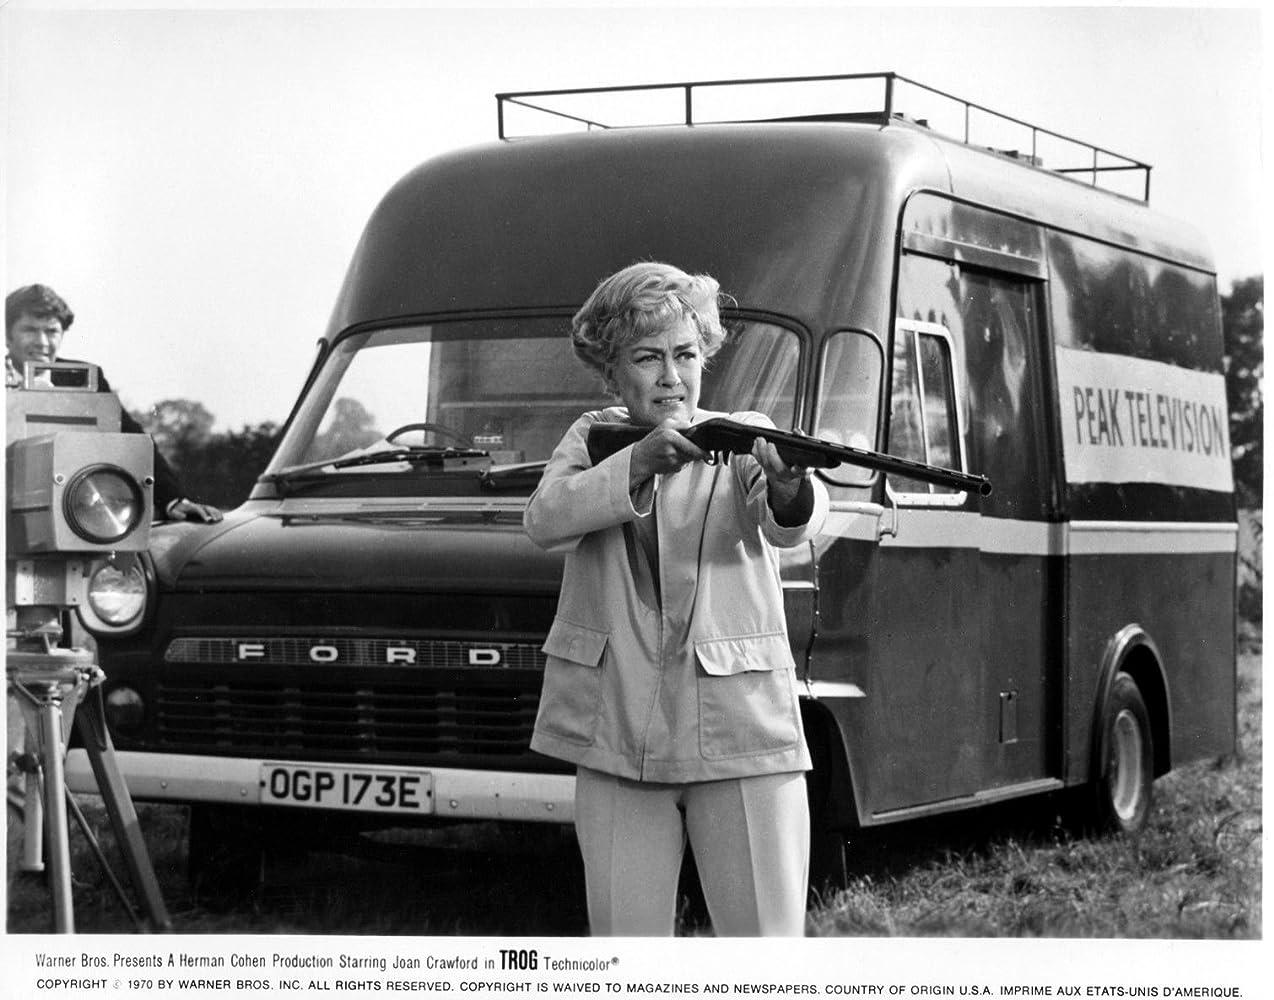 Joan Crawford in Trog (1970)